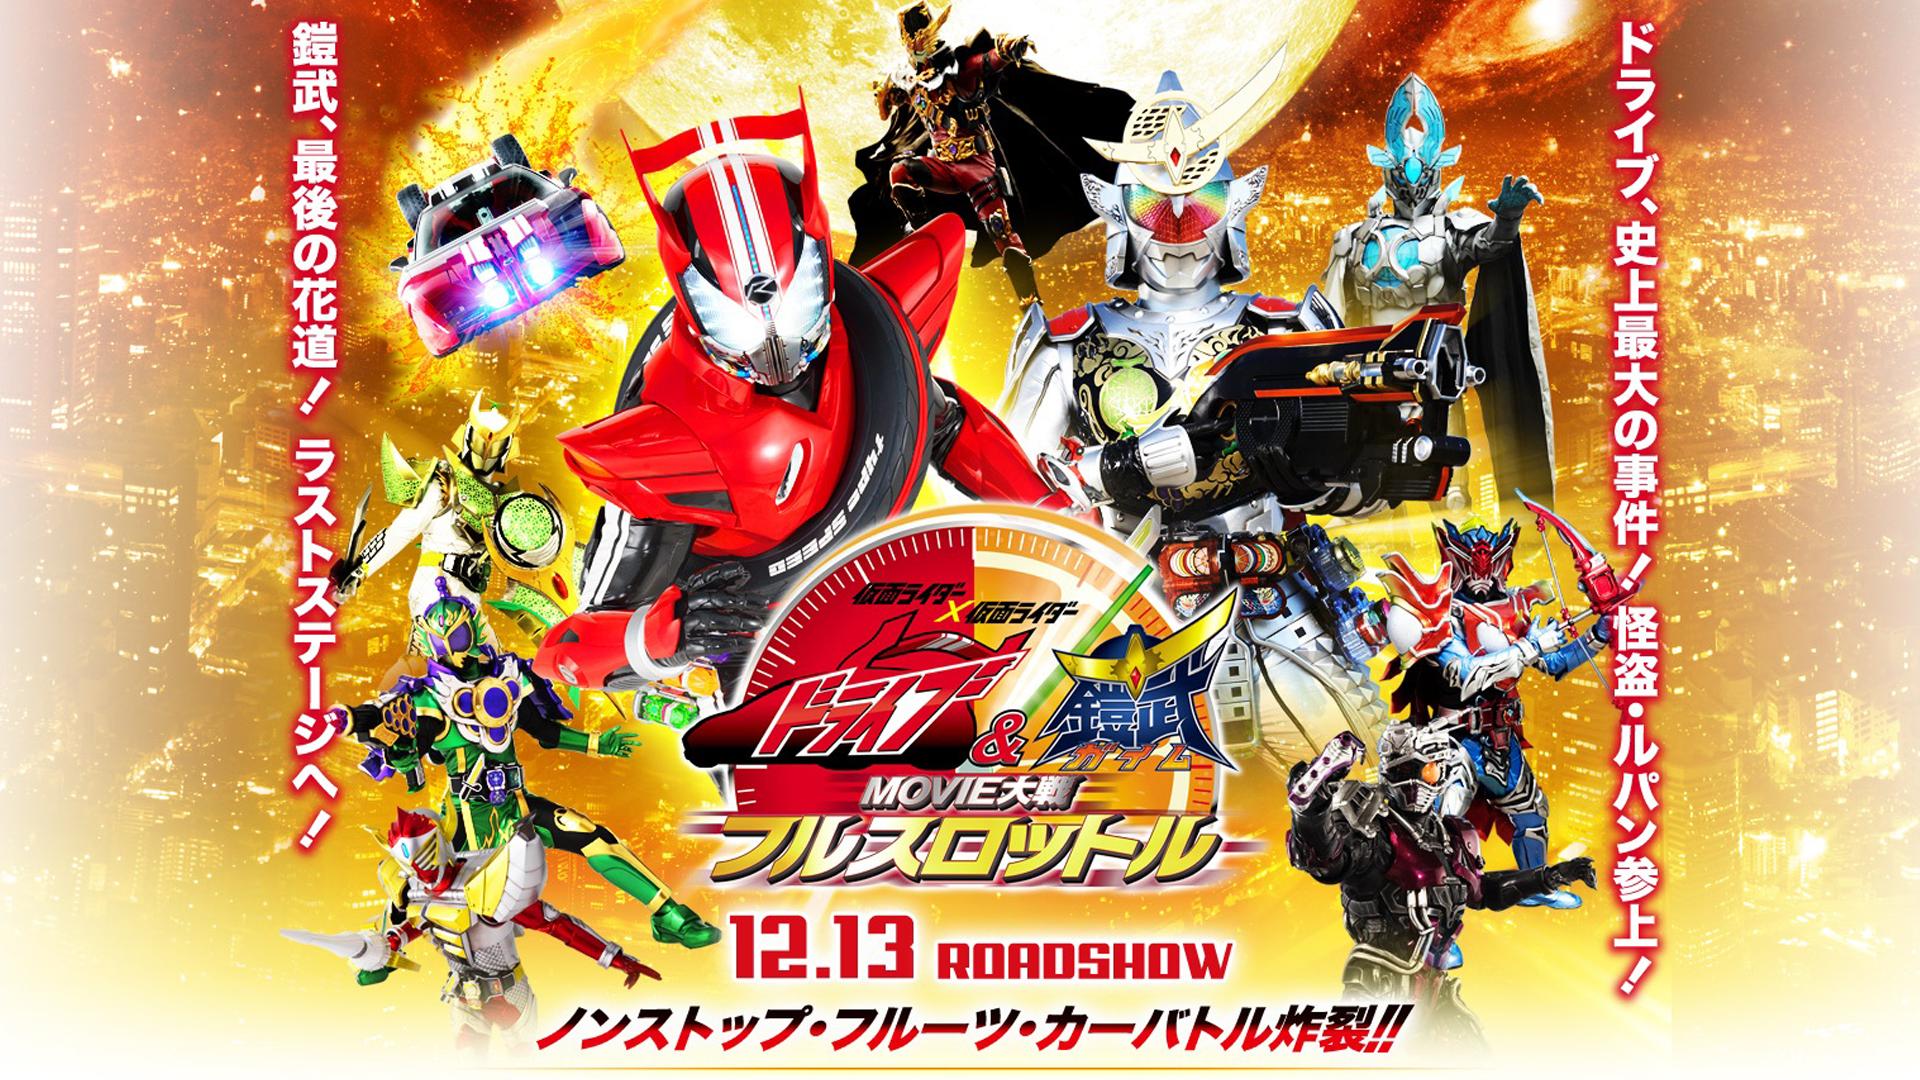 Kamen Rider Drive X Gaim MOVIE Wars: Full Throttle by Kamen